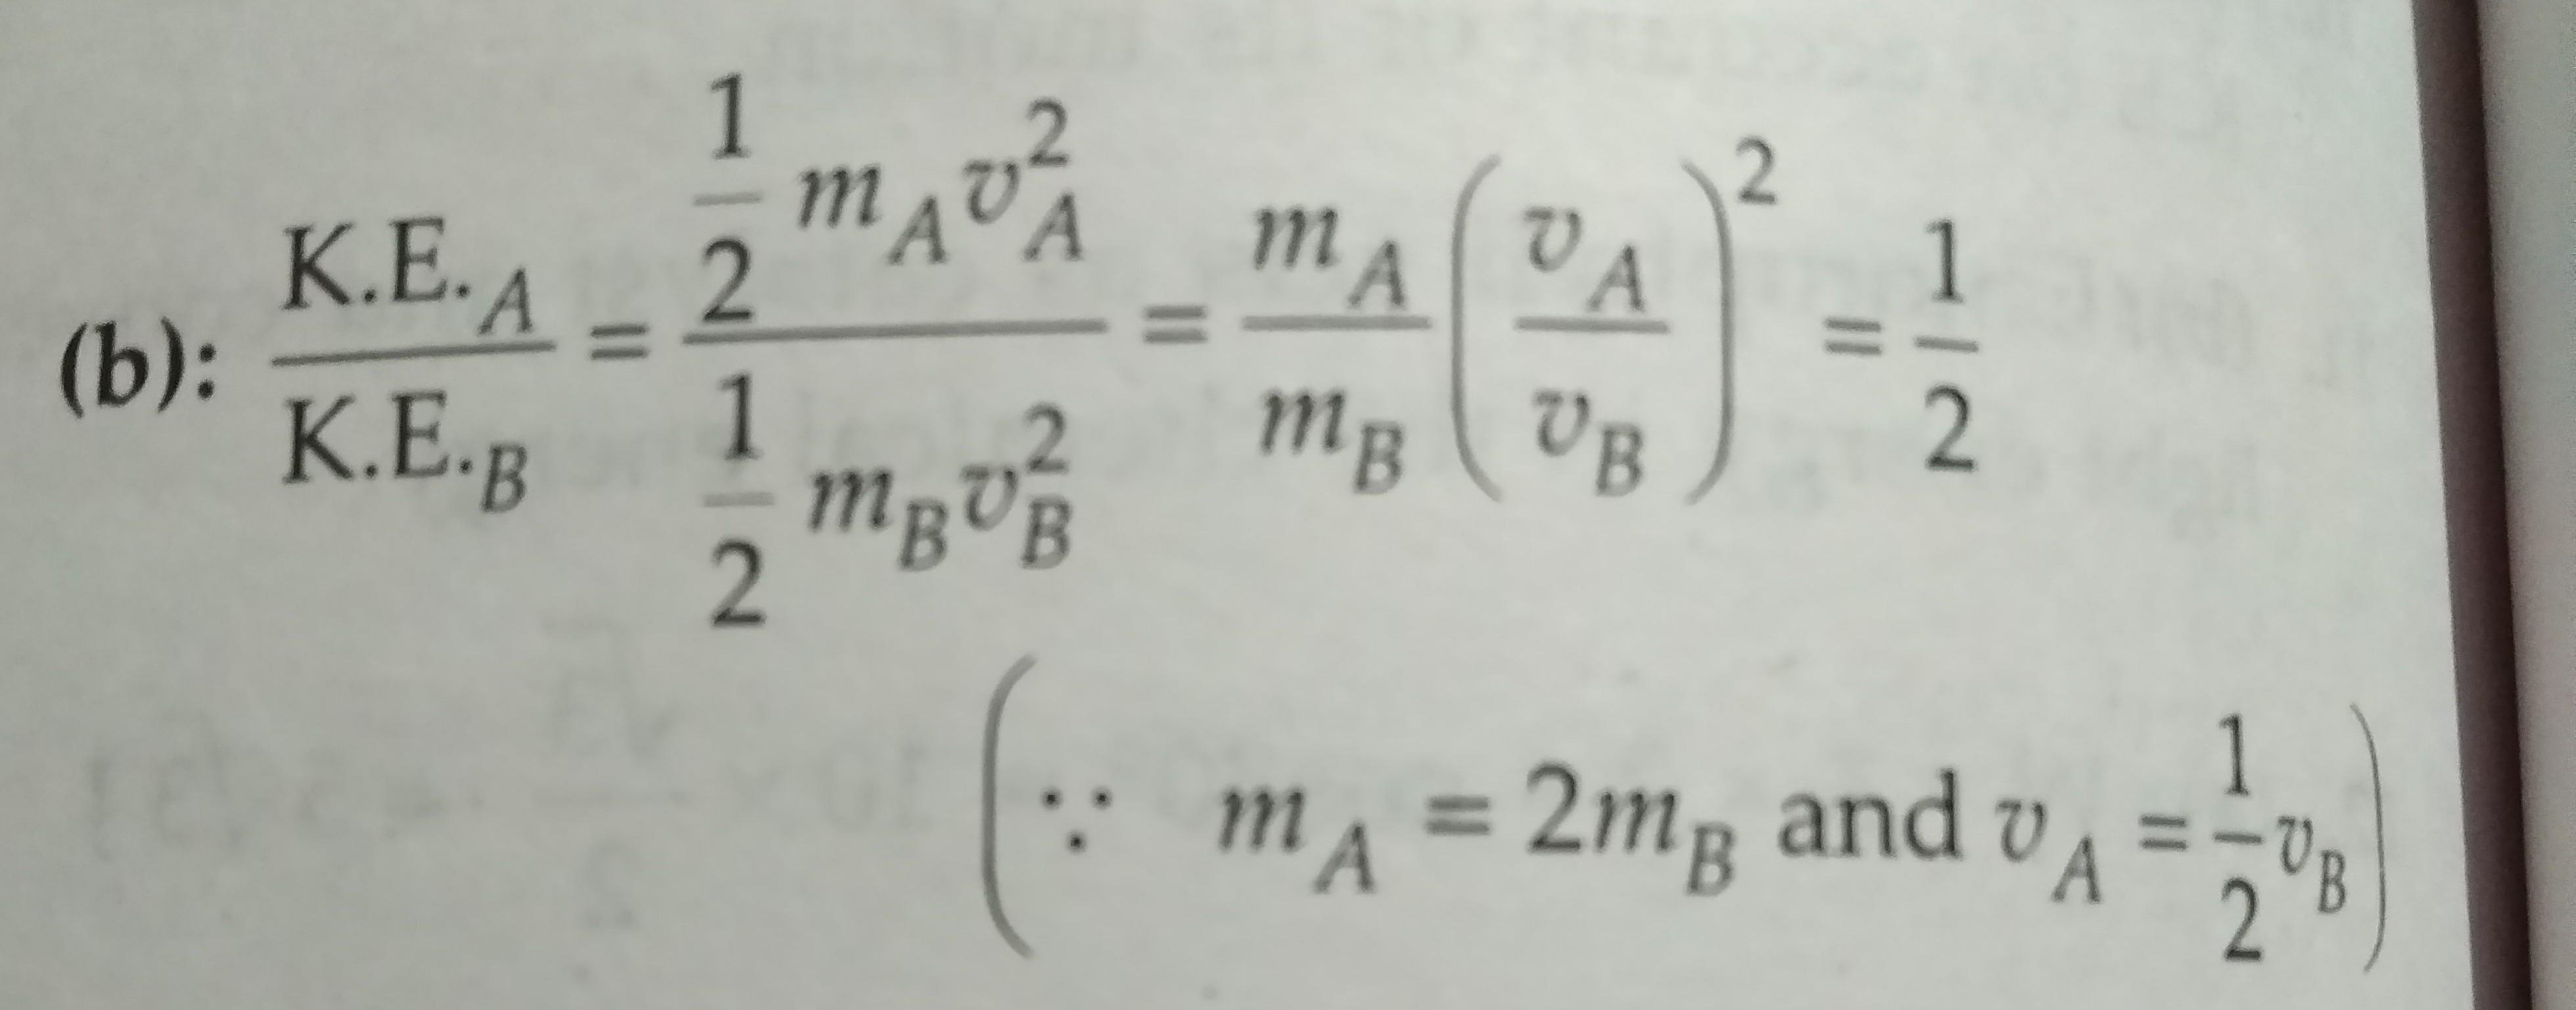 Kinetic Energy Equation Doubling Velocity